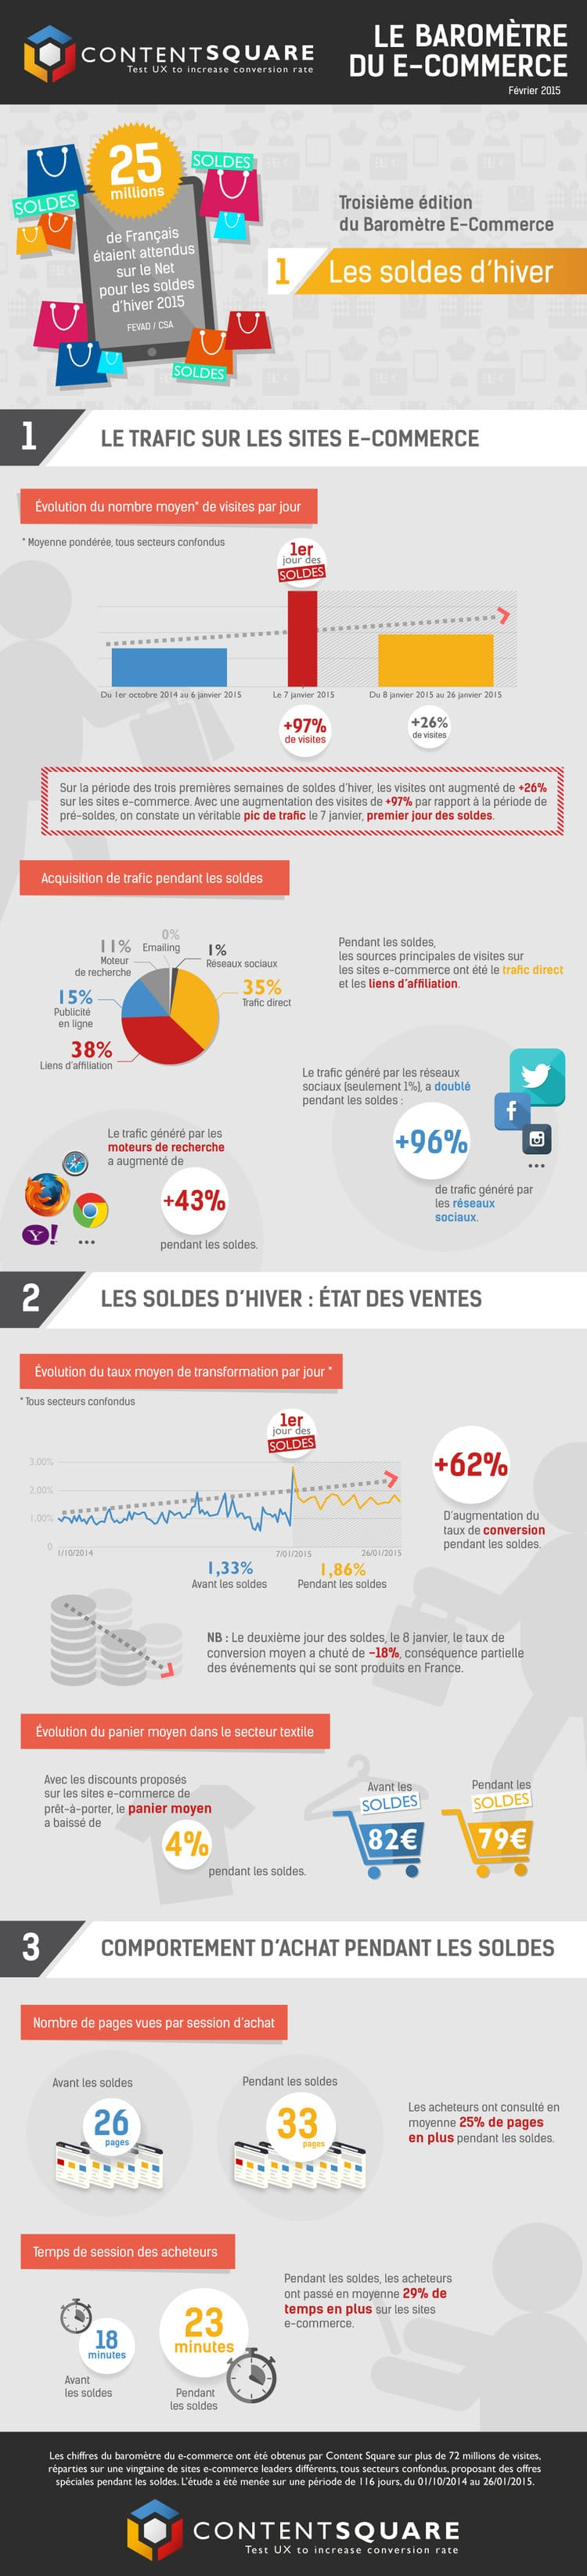 infographie-bilan-soldes-hiver-2015